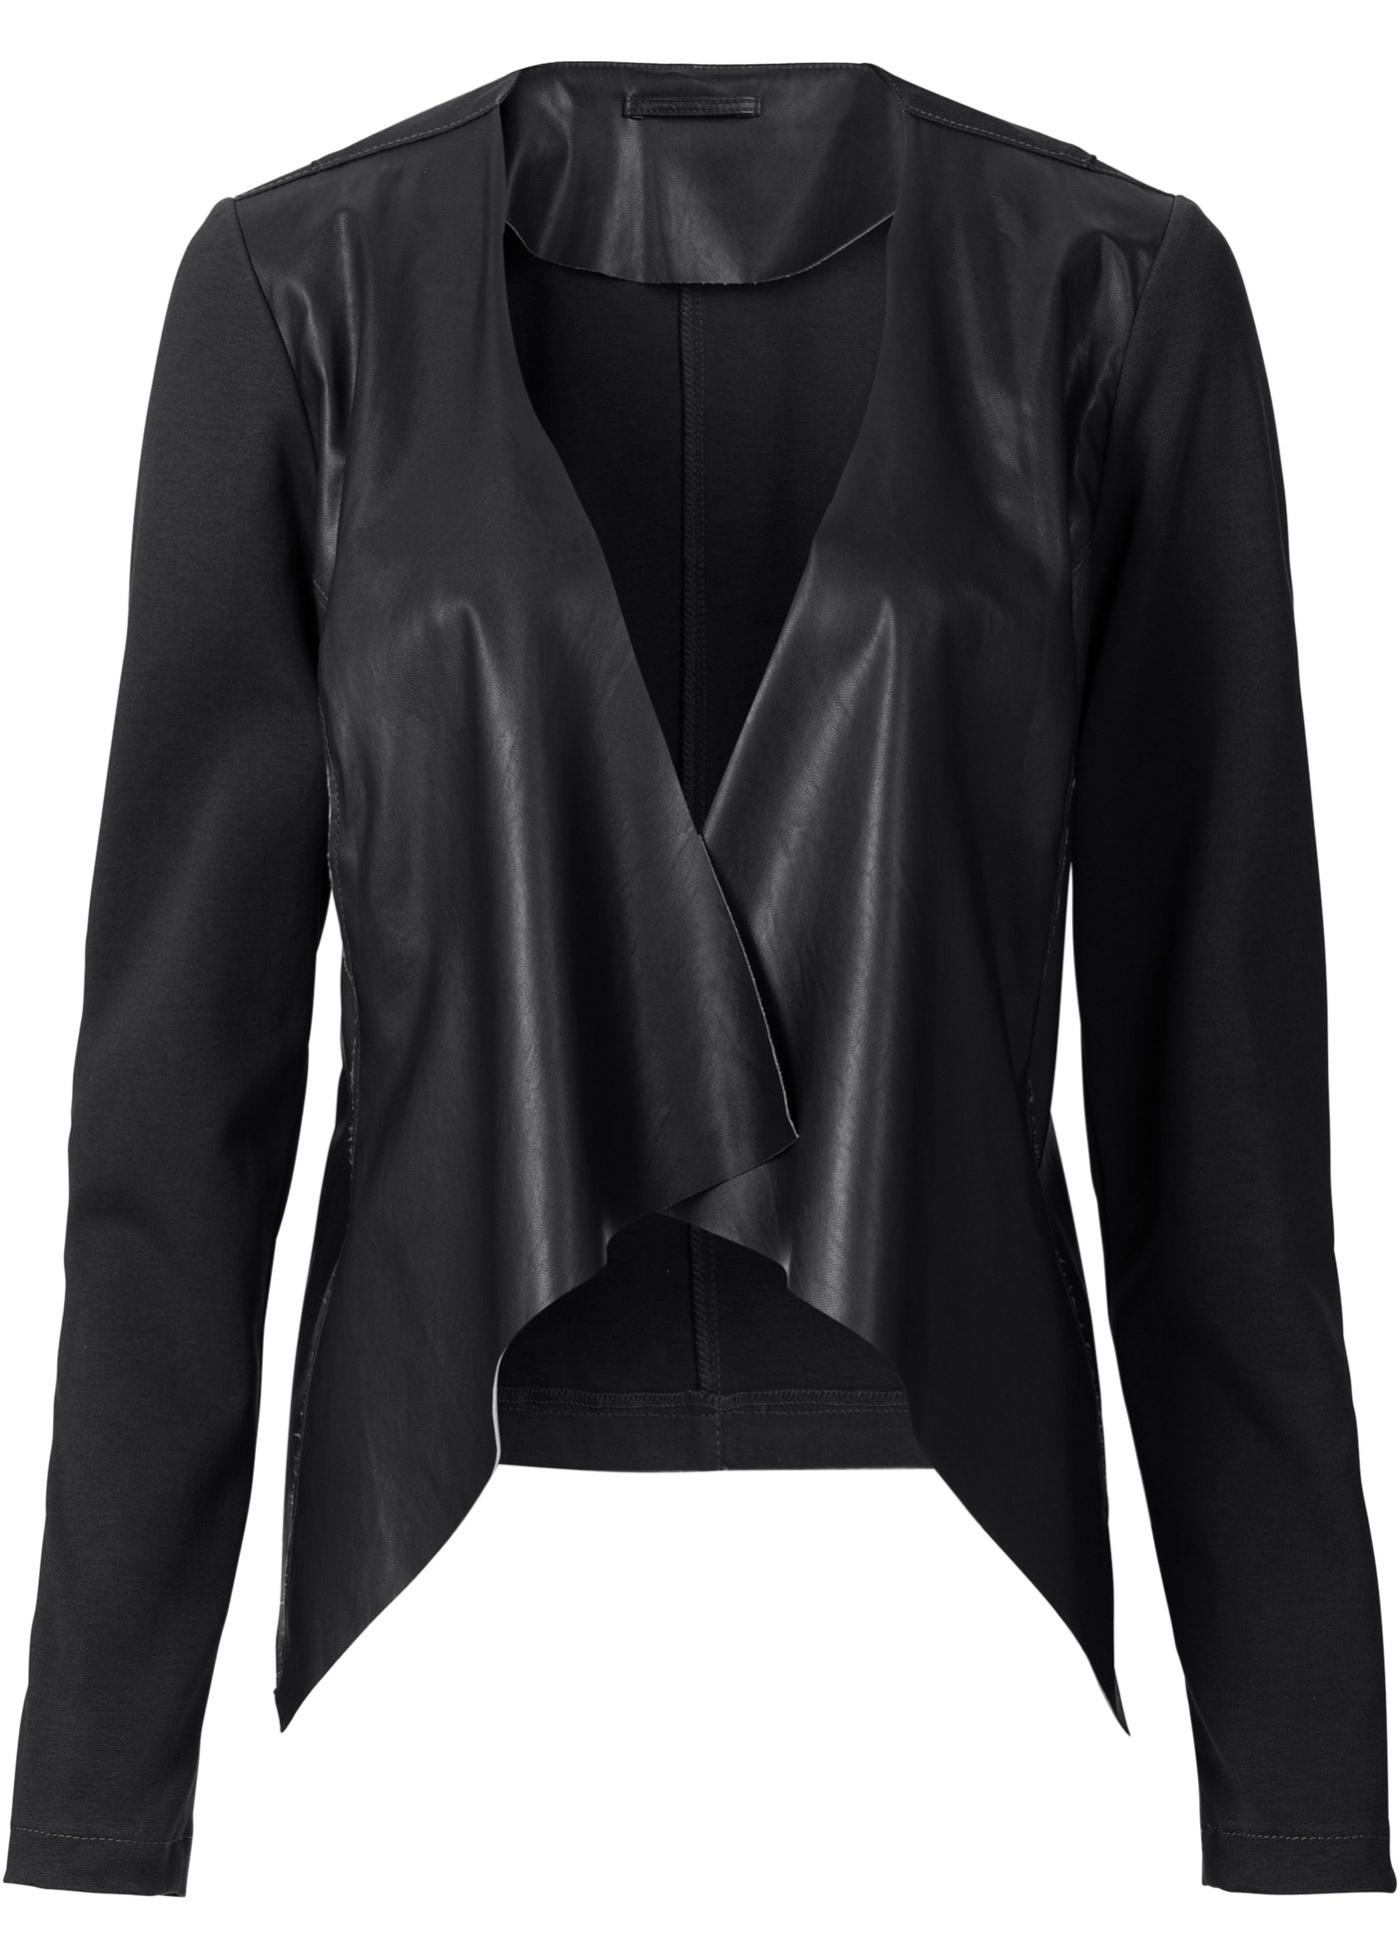 Blazer synthétique imitation cuir noir manches...